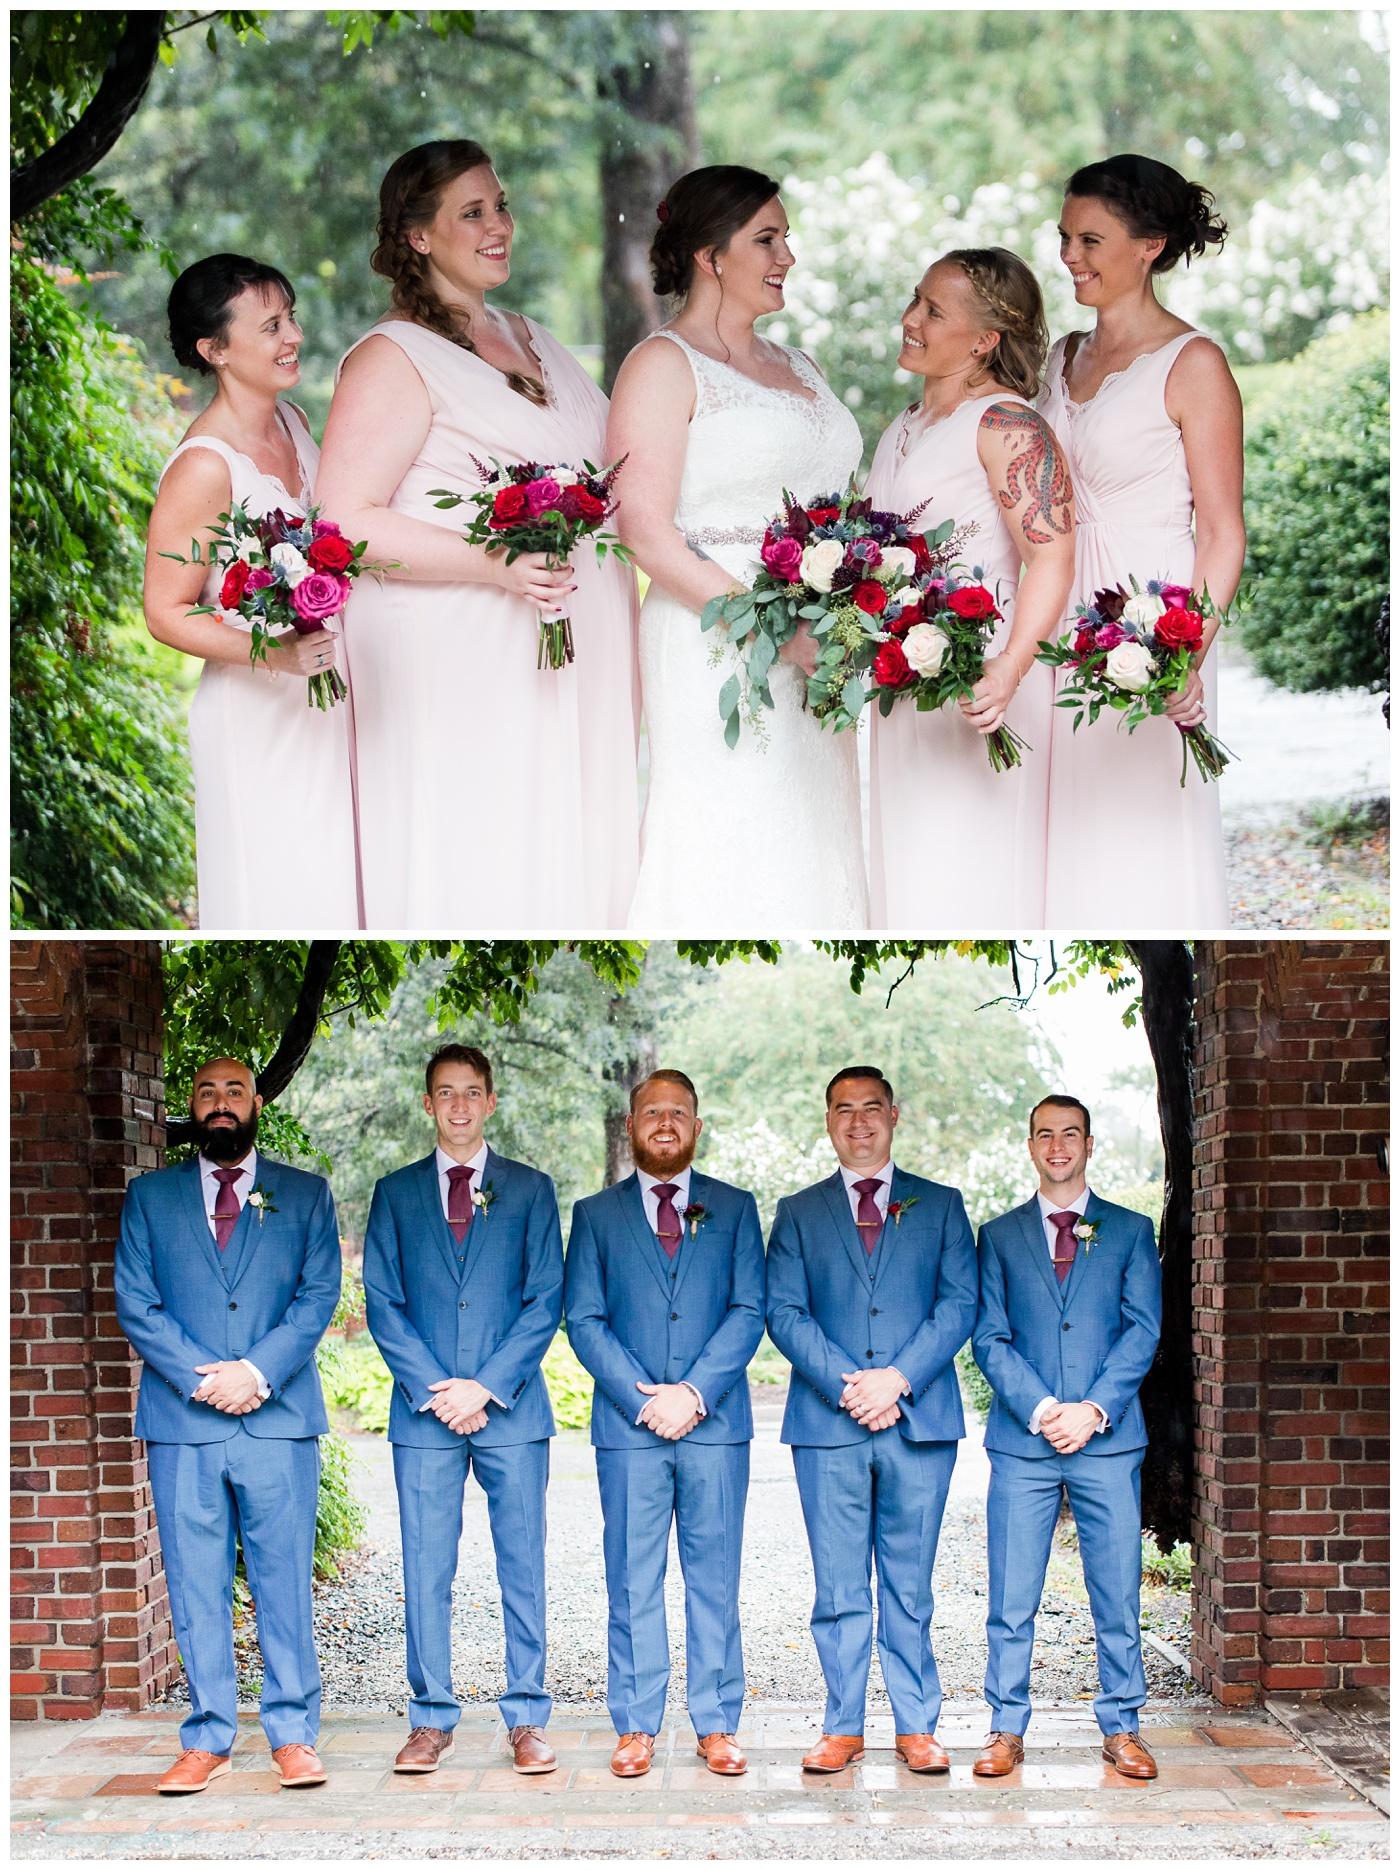 Meagan & Erik | Hermitage Museum & Garden Wedding